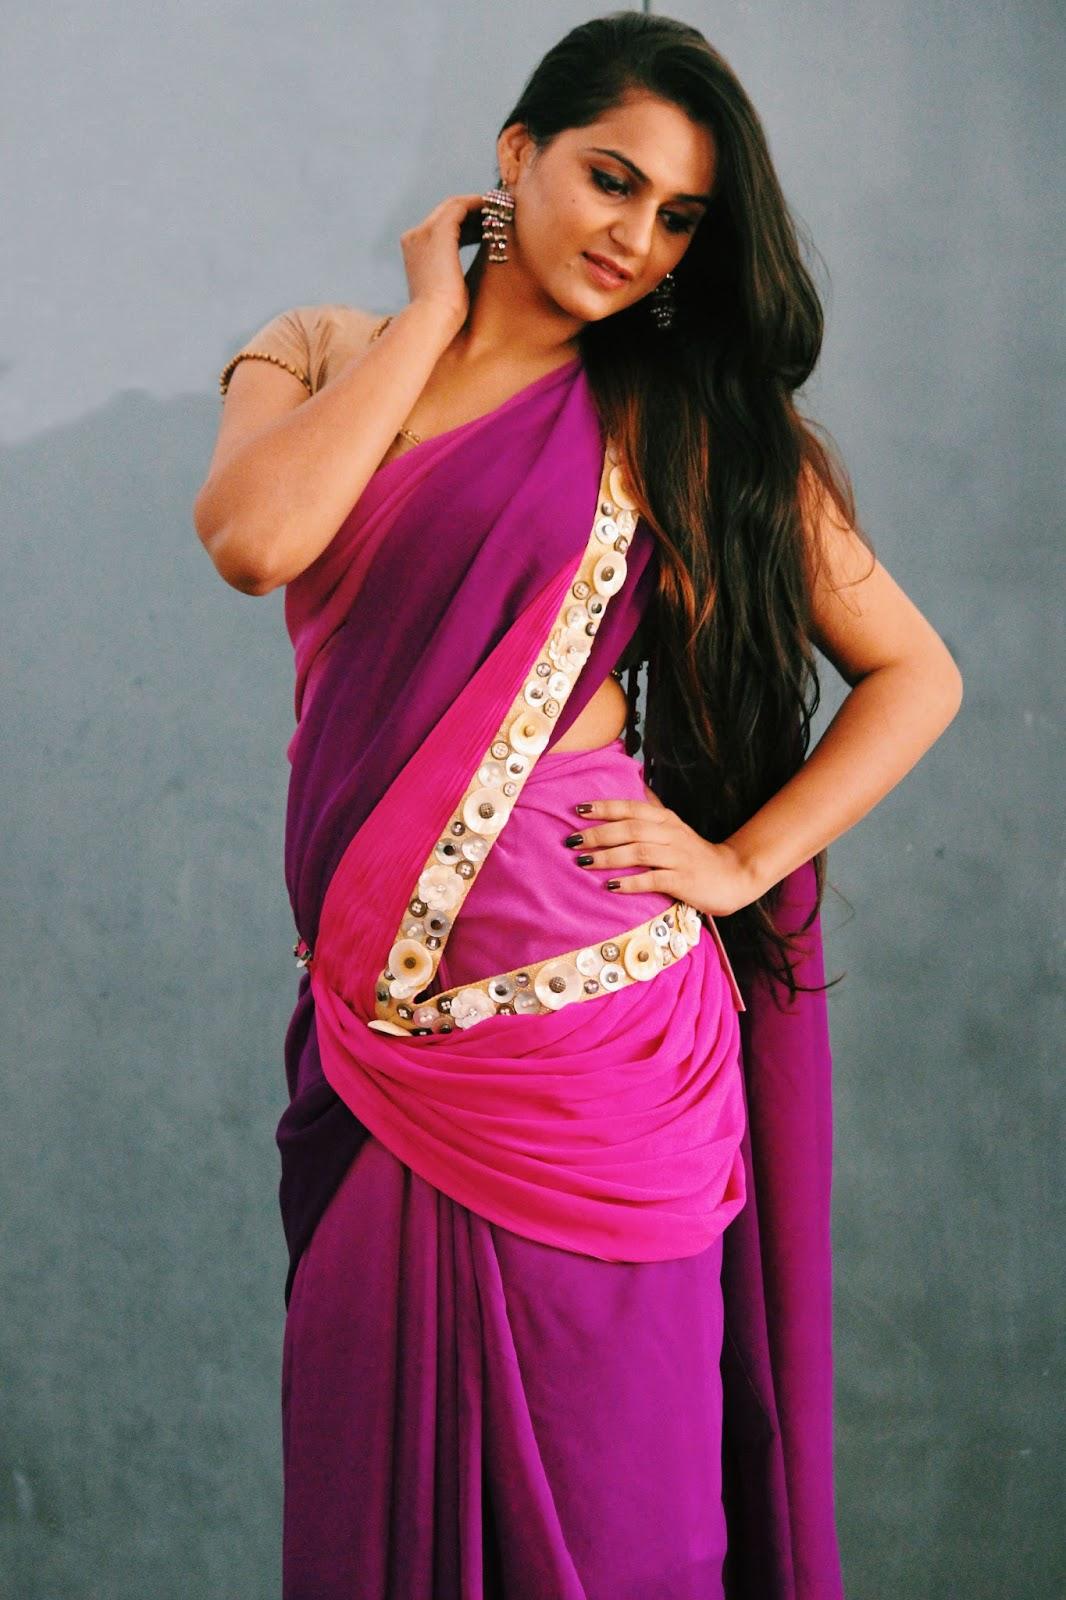 Indian hot woman, in pantyhose miami cheerleaders